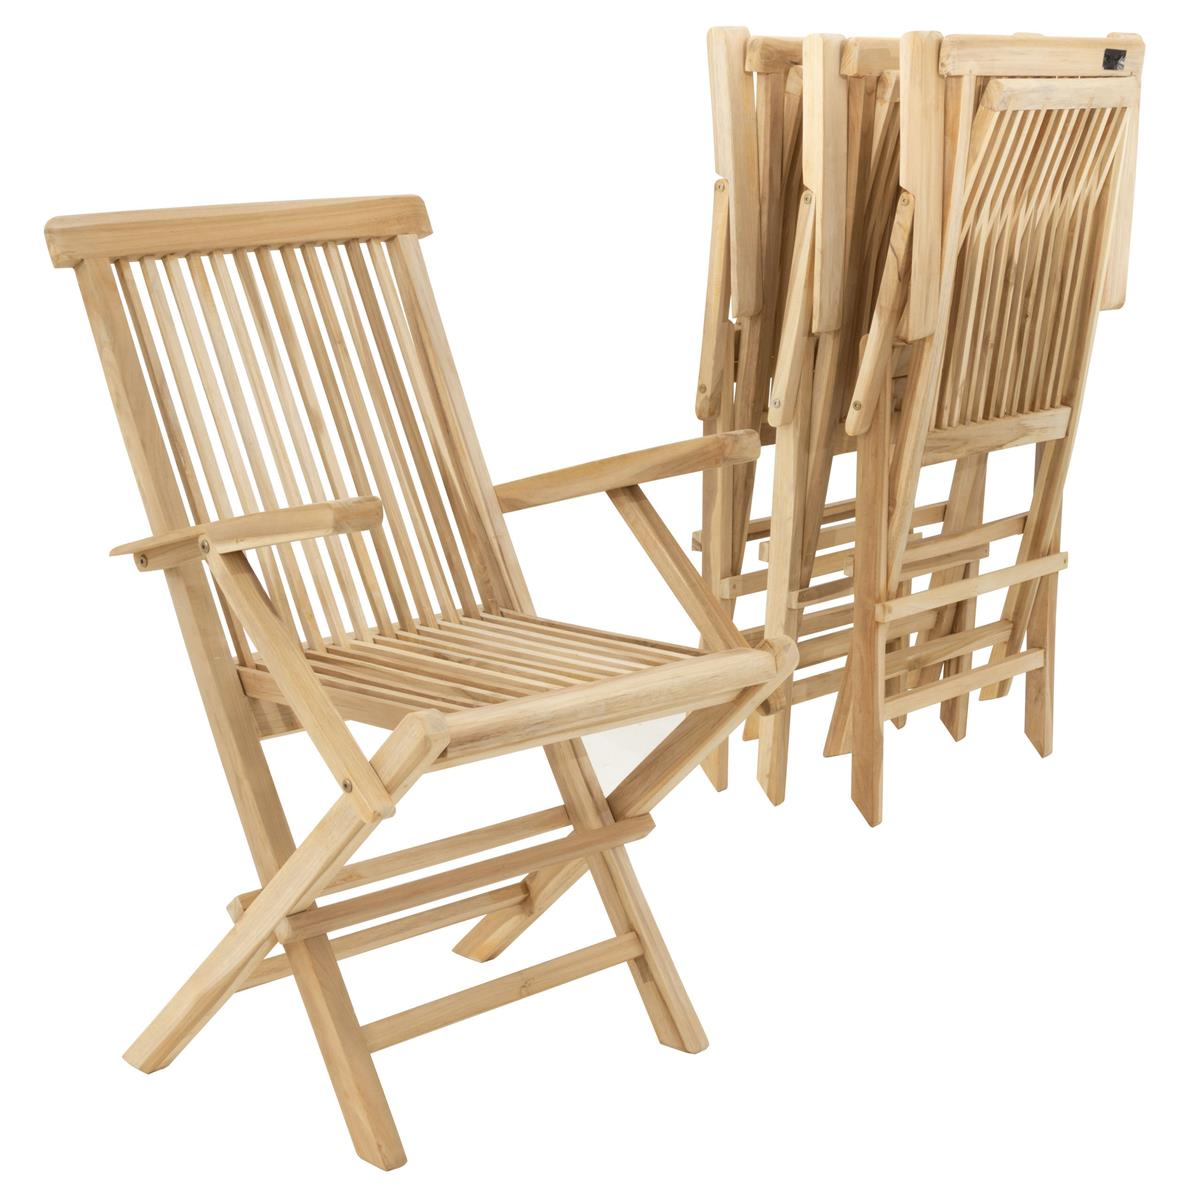 DIVERO 4er Set Gartenstuhl Klappstuhl Hochlehner Armlehnen Teak Holz natur